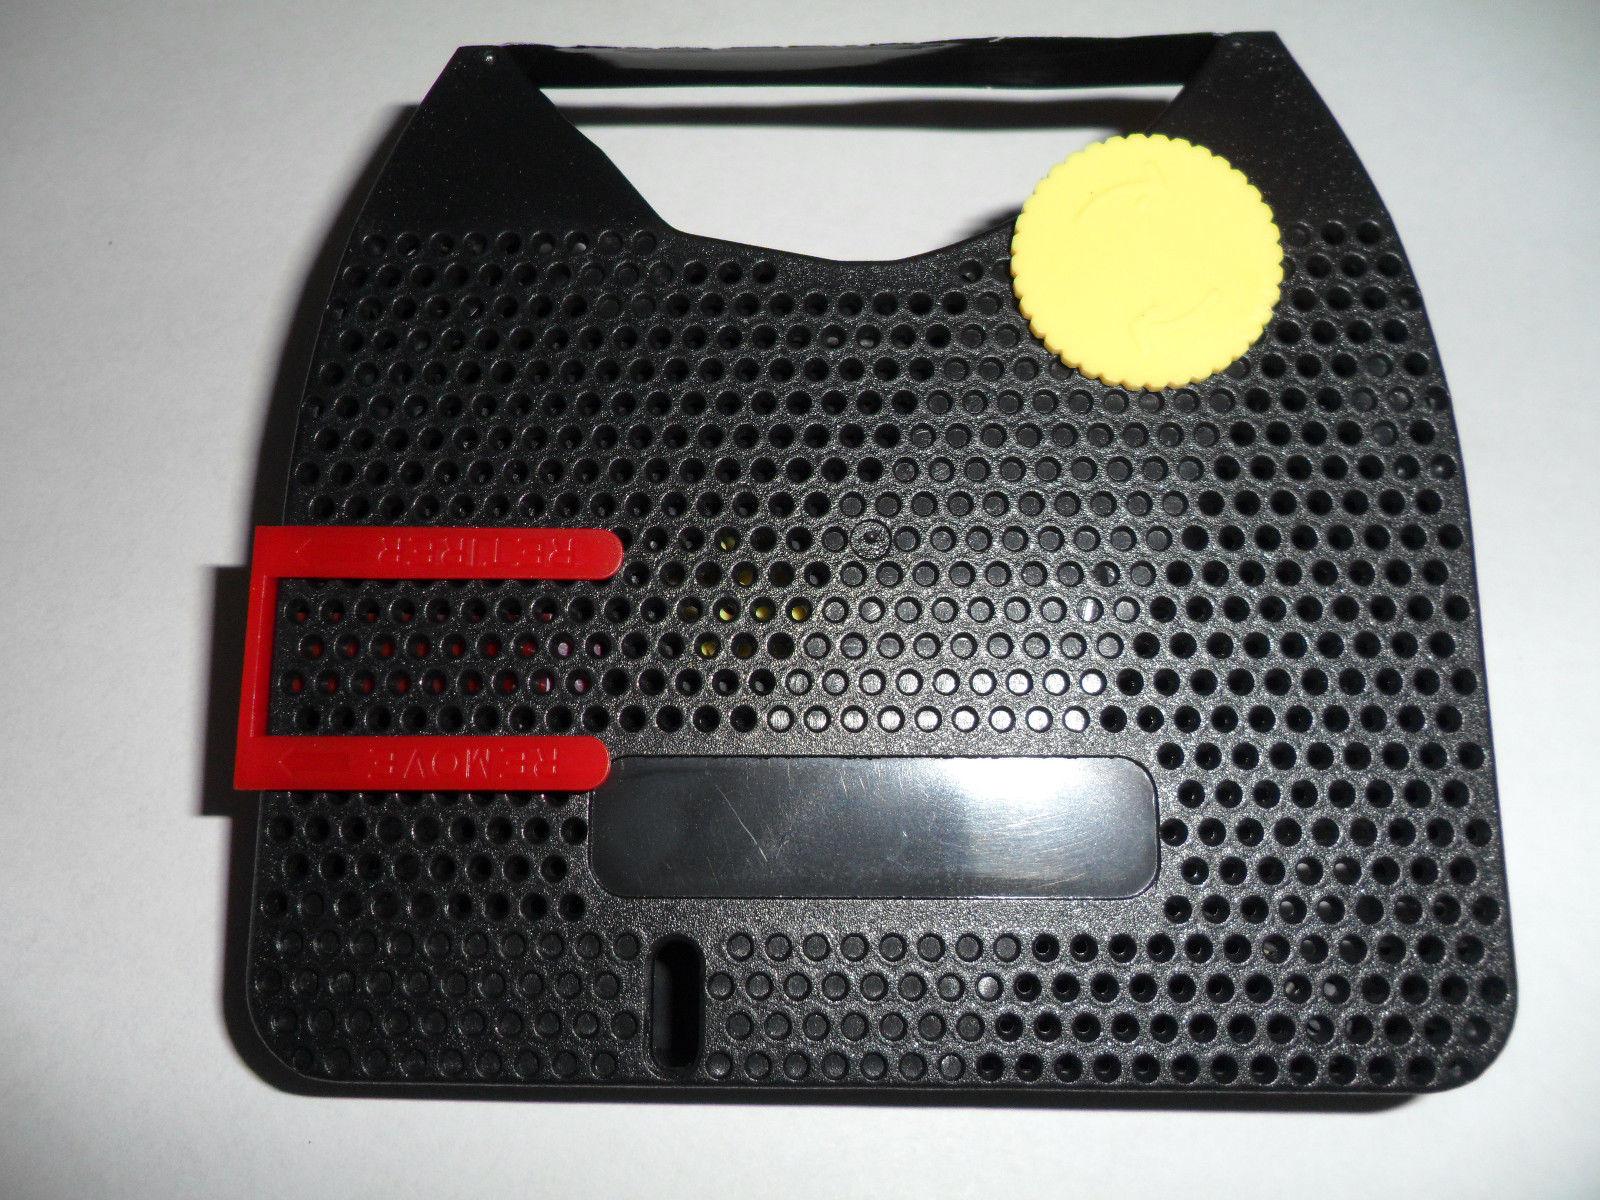 Smith Corona CXL4700/Deville 100 Typewriter Ribbon (2 Pack) Replaces 21000 B268